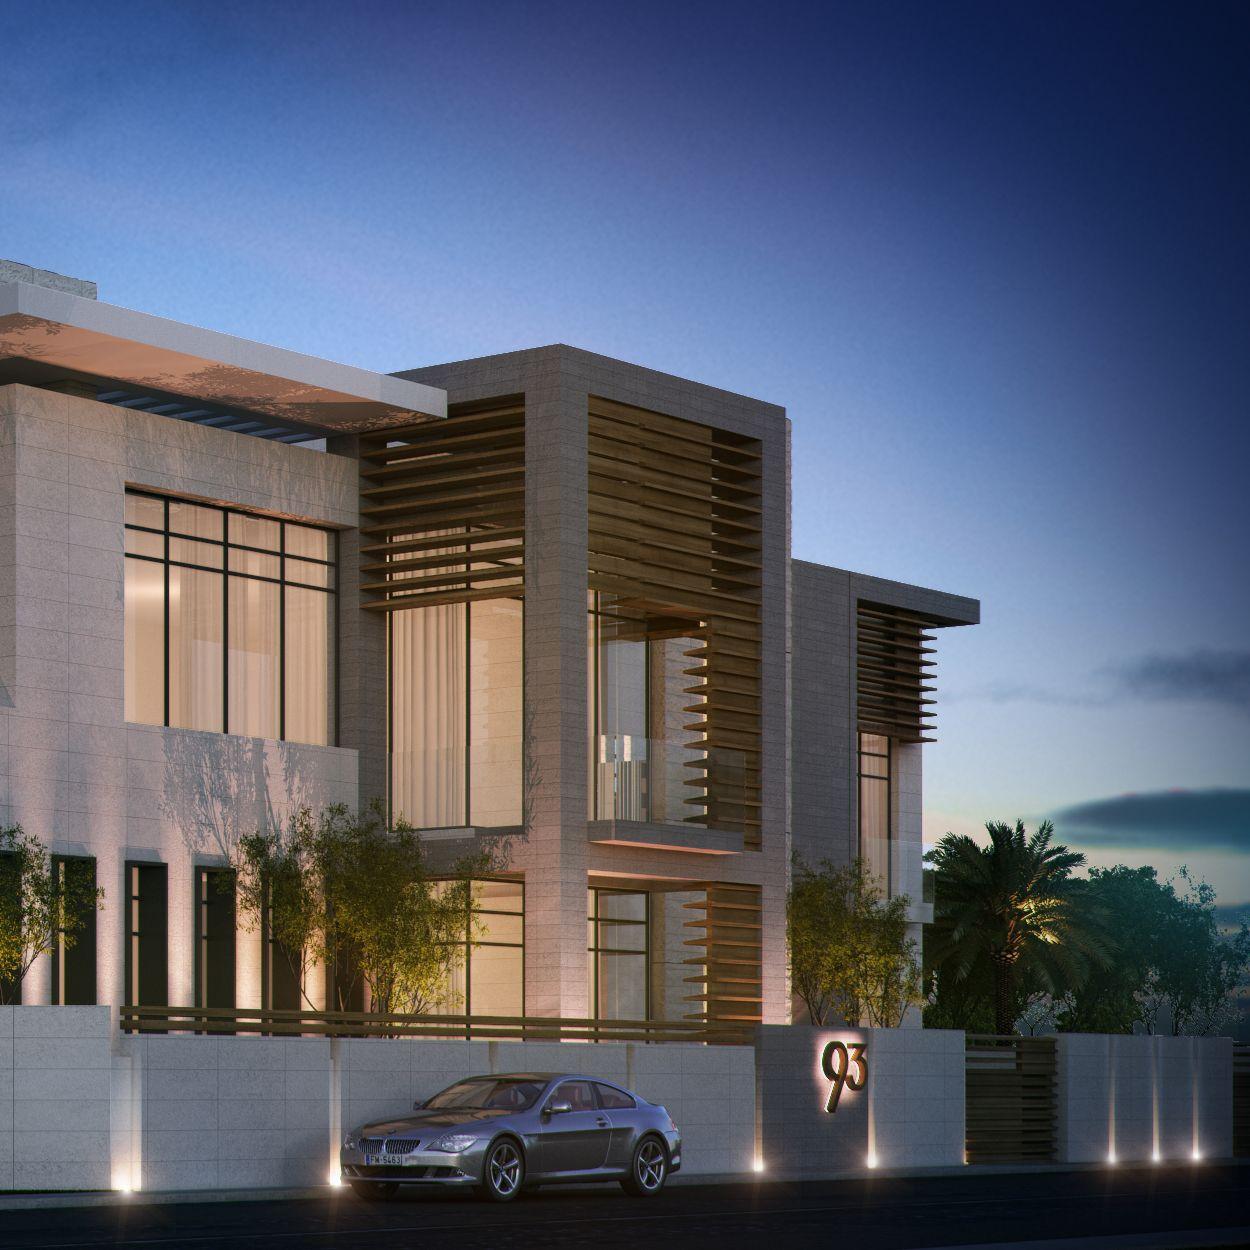 uae ajman private villa sarah sadeq architects sarah sadeq architectes pinterest uae. Black Bedroom Furniture Sets. Home Design Ideas